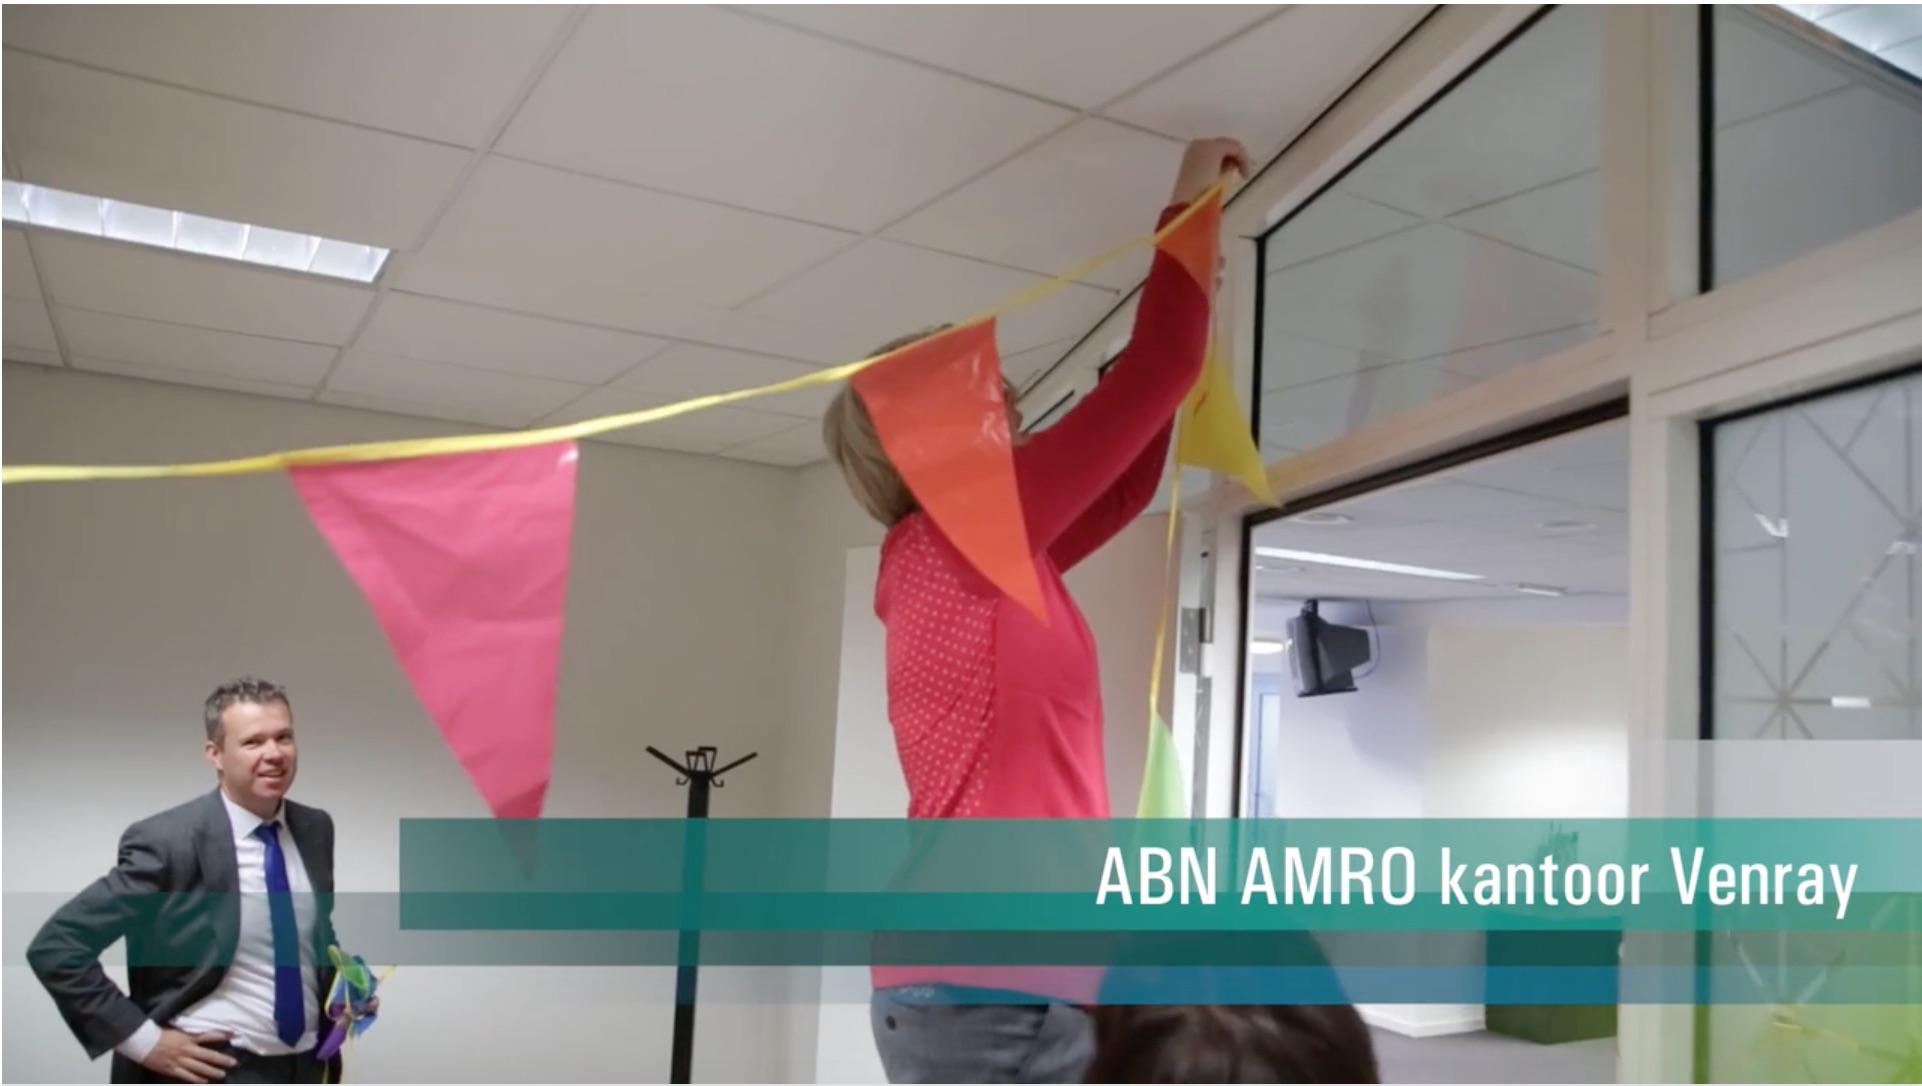 Promo video ABN AMRO